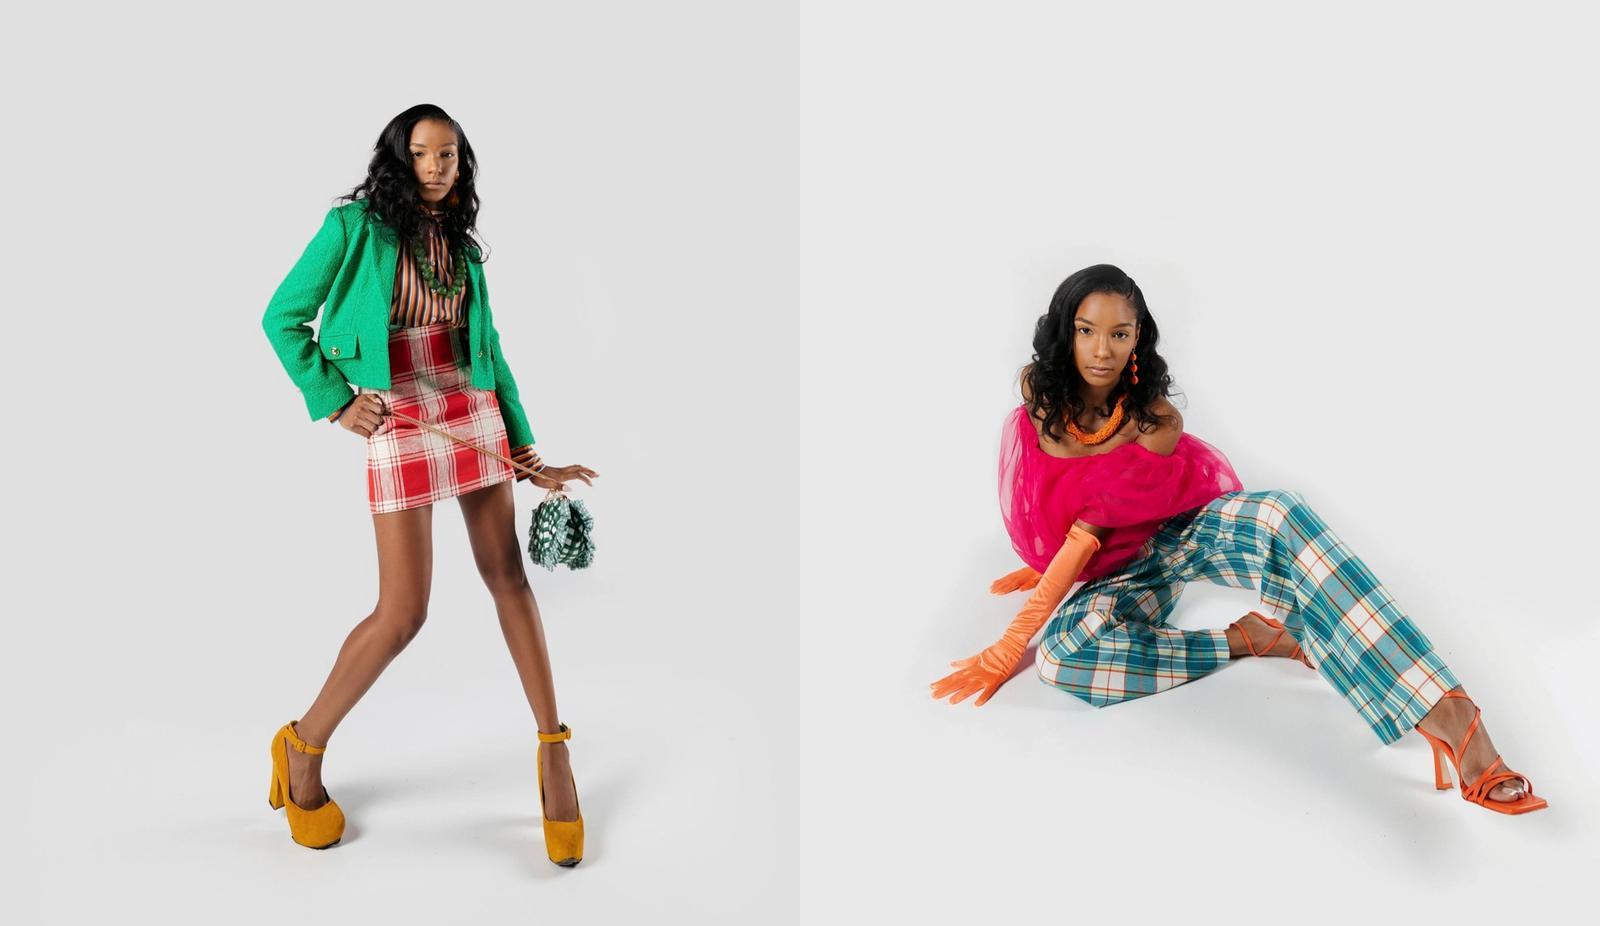 Stylist: Anita Johnson, Photographer: Tyler Hooks, Model: Jessica Brisco